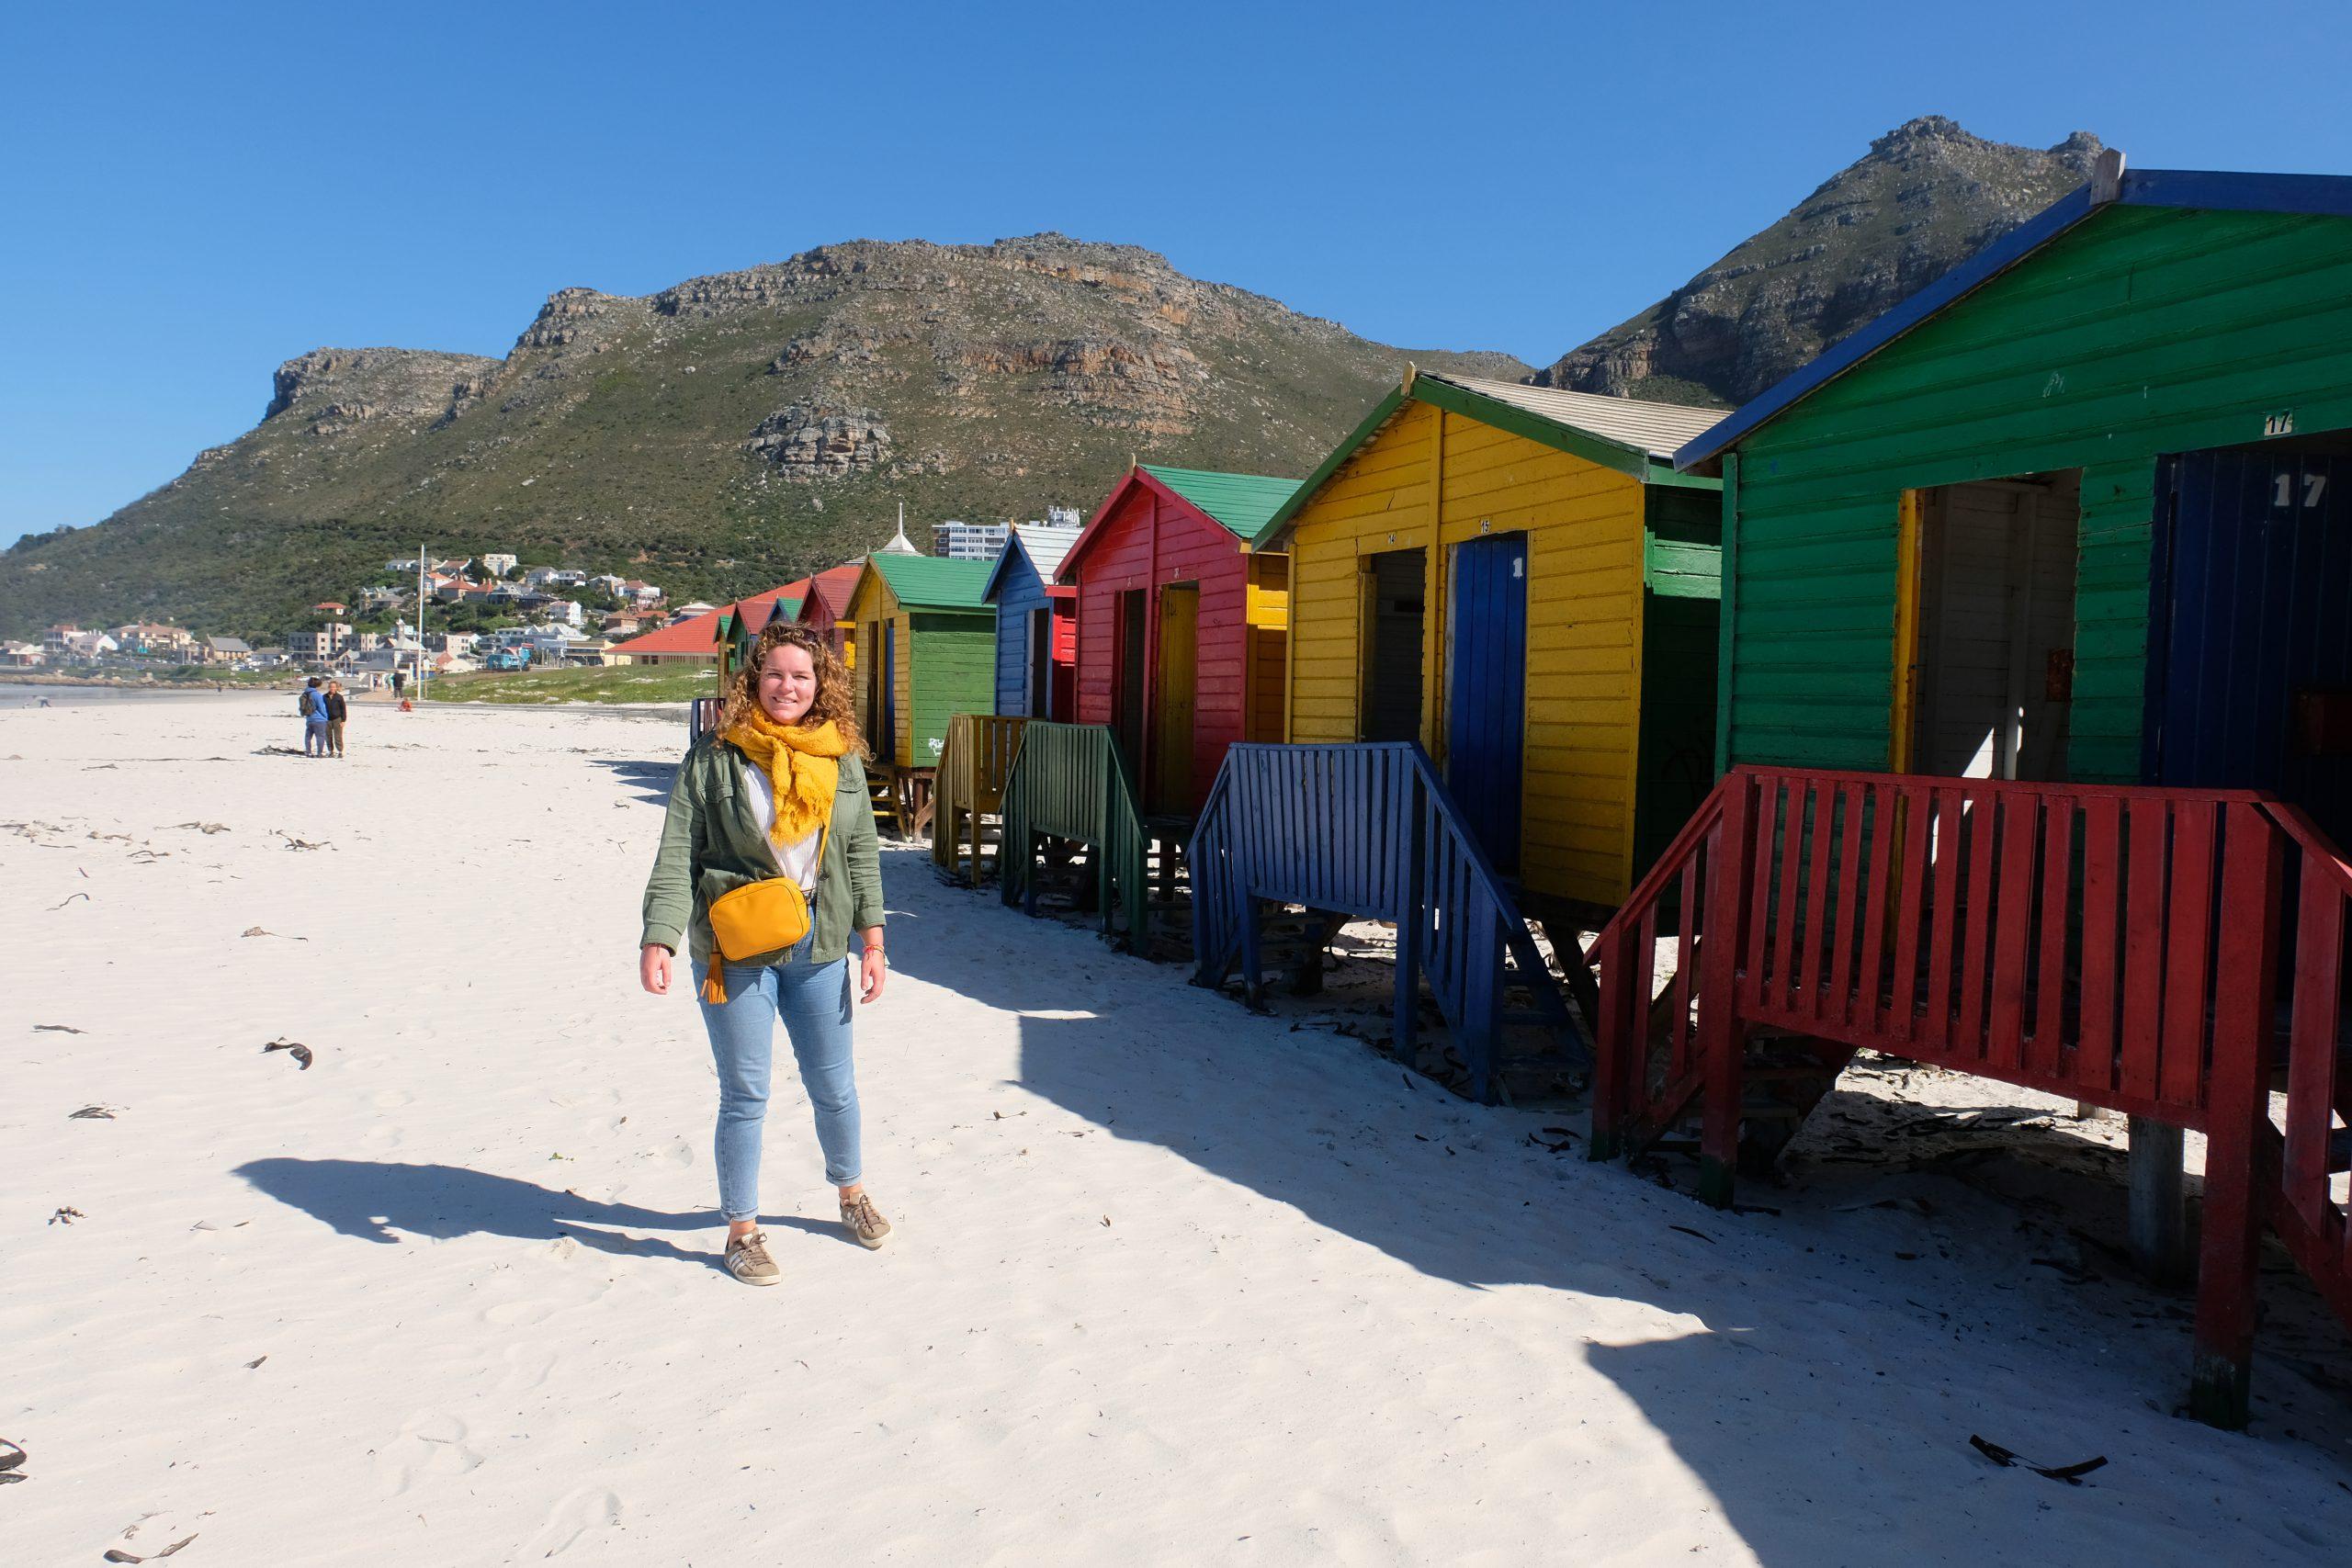 Felgekleurde strandhuisjes bij Muizenberg Zuid-Afrika